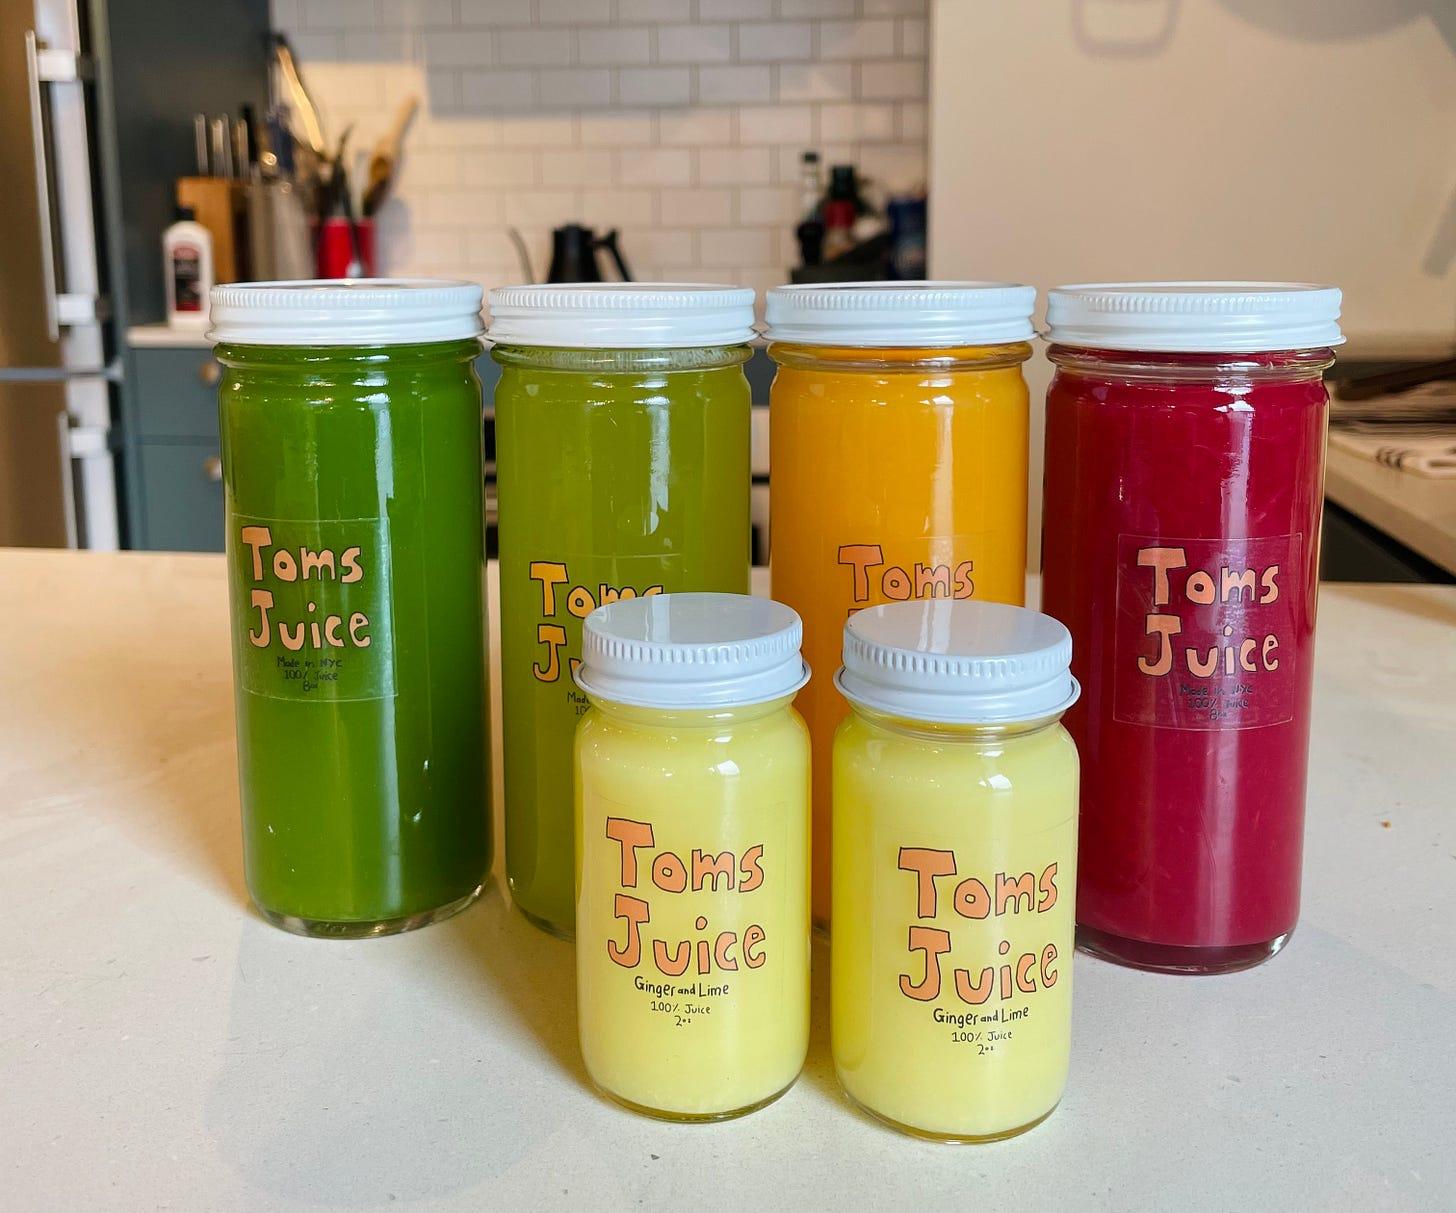 Toms Juice